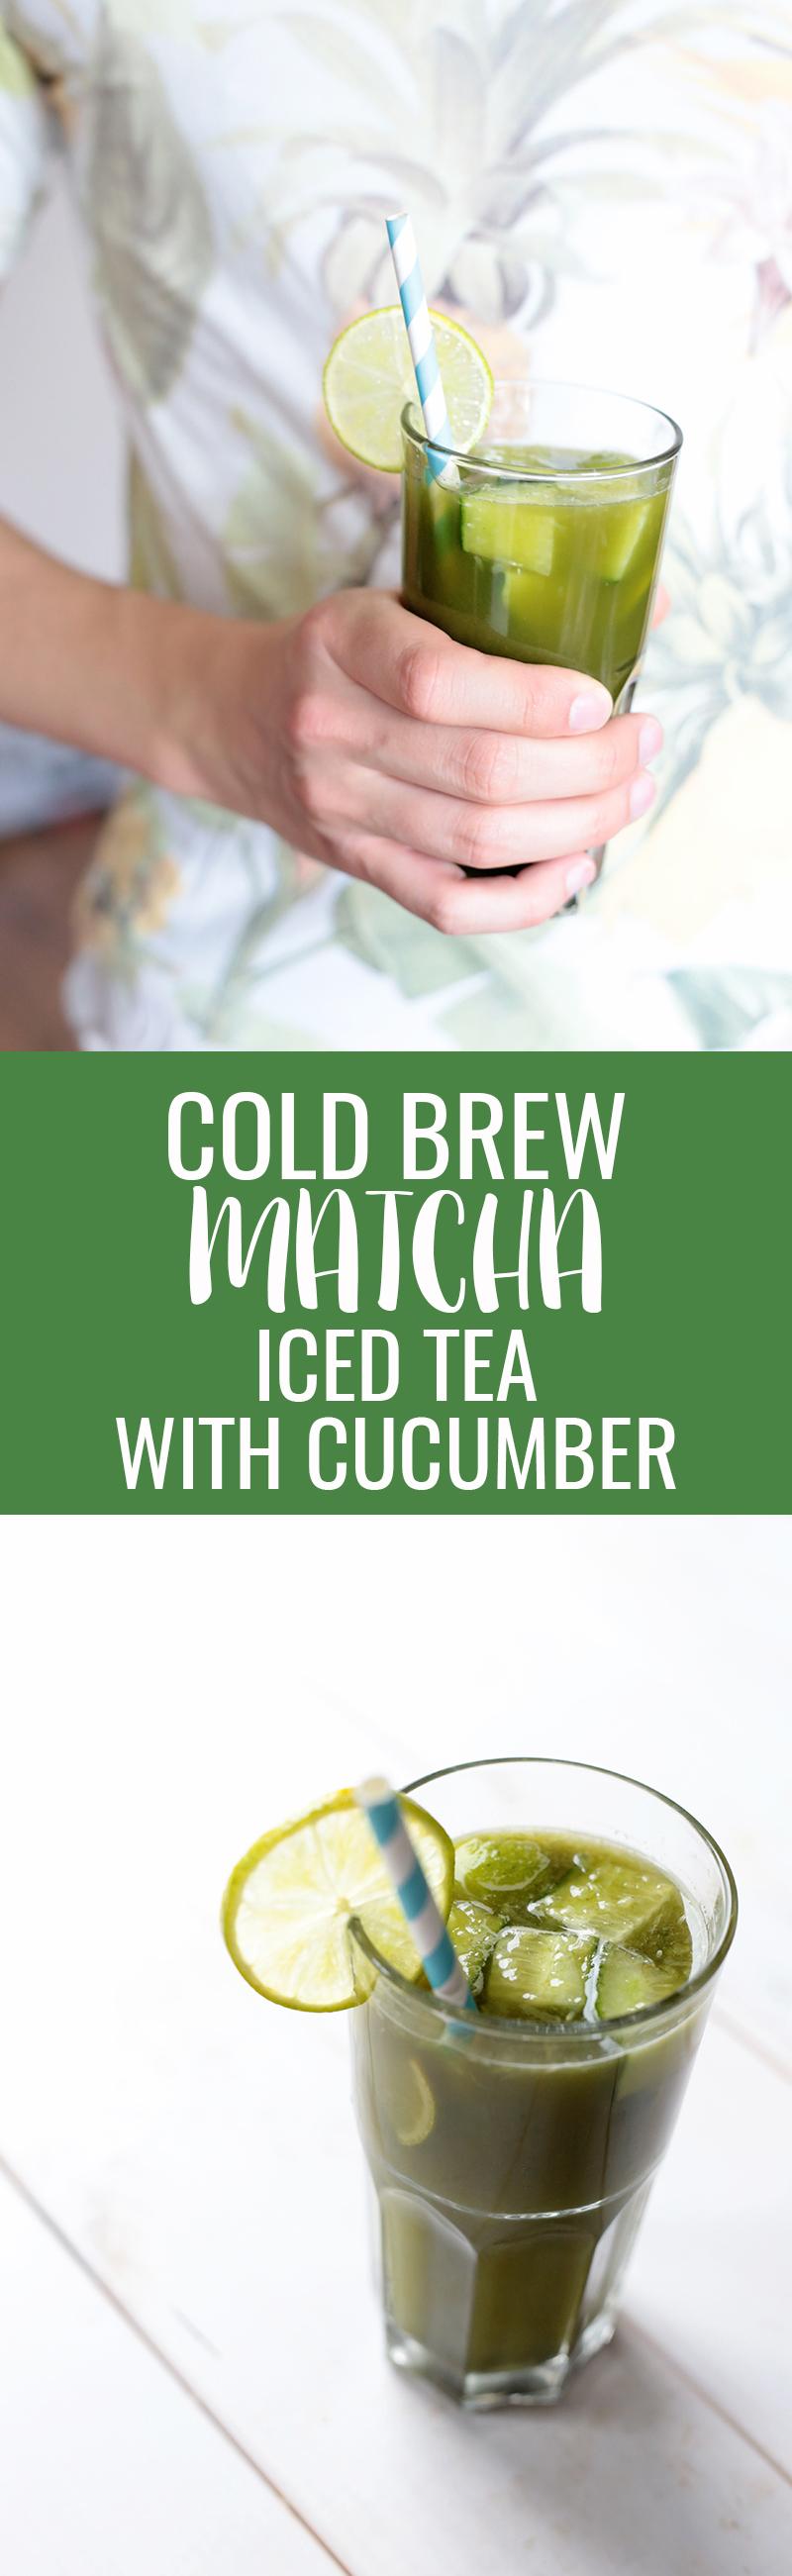 Matcha Iced Tea